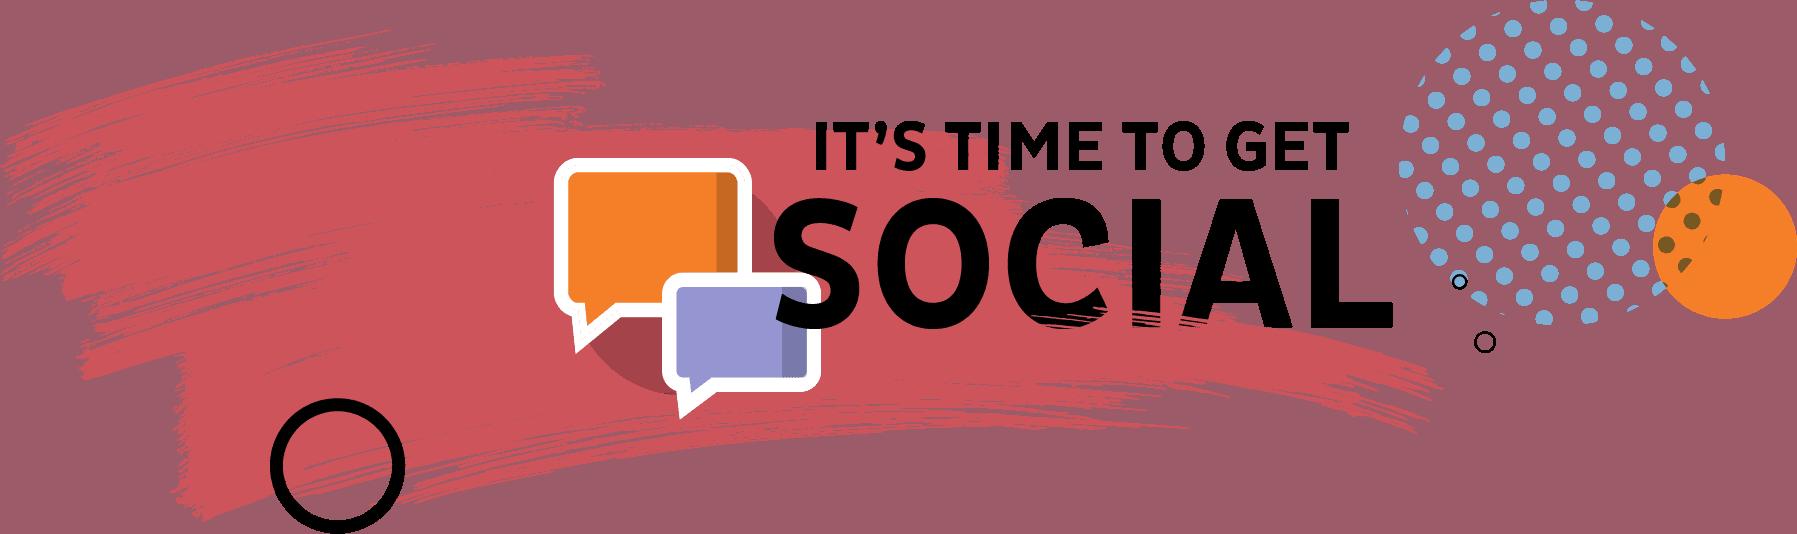 Ocreative-Services_SocialMediaHeader